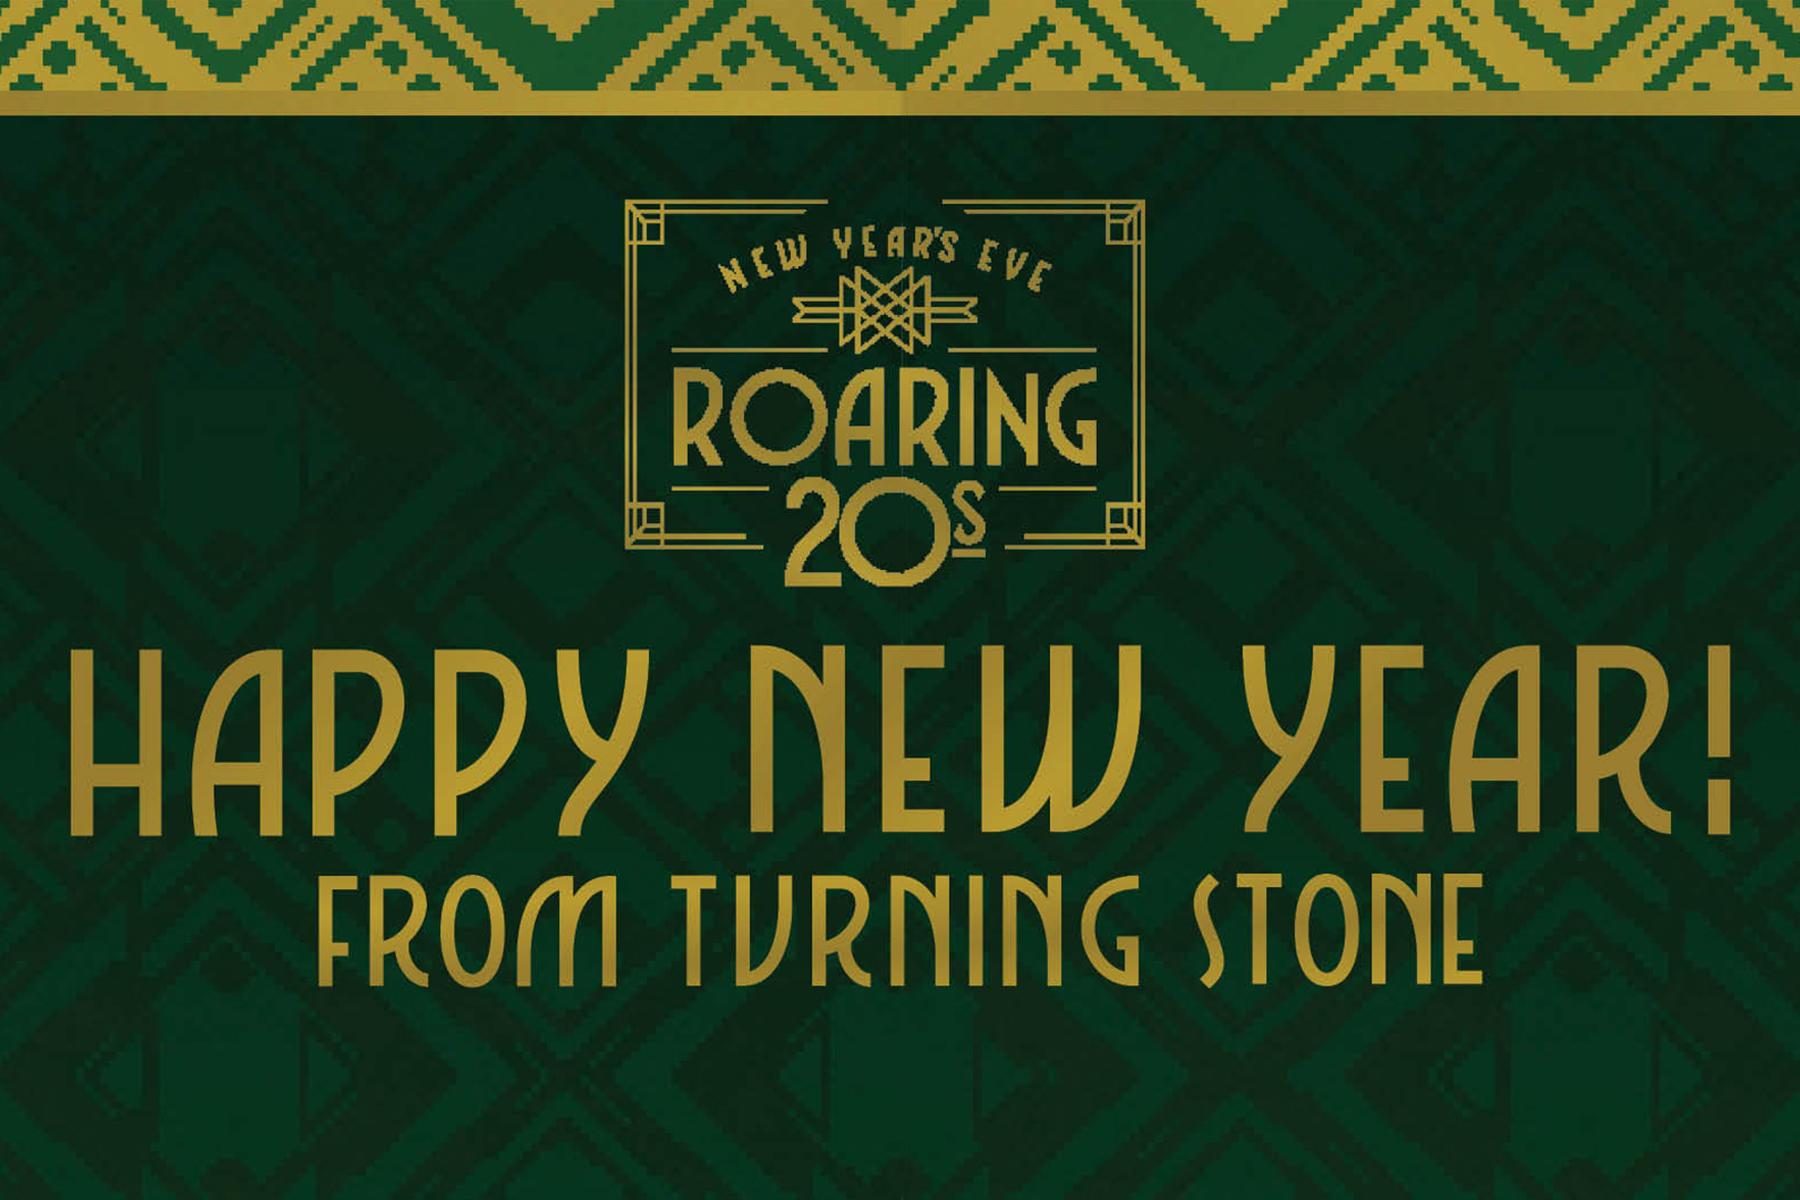 Turning Stone March Bingo Calendar | Printable Calendar with regard to 10K Bingo Turning Stone Bingo October 2022